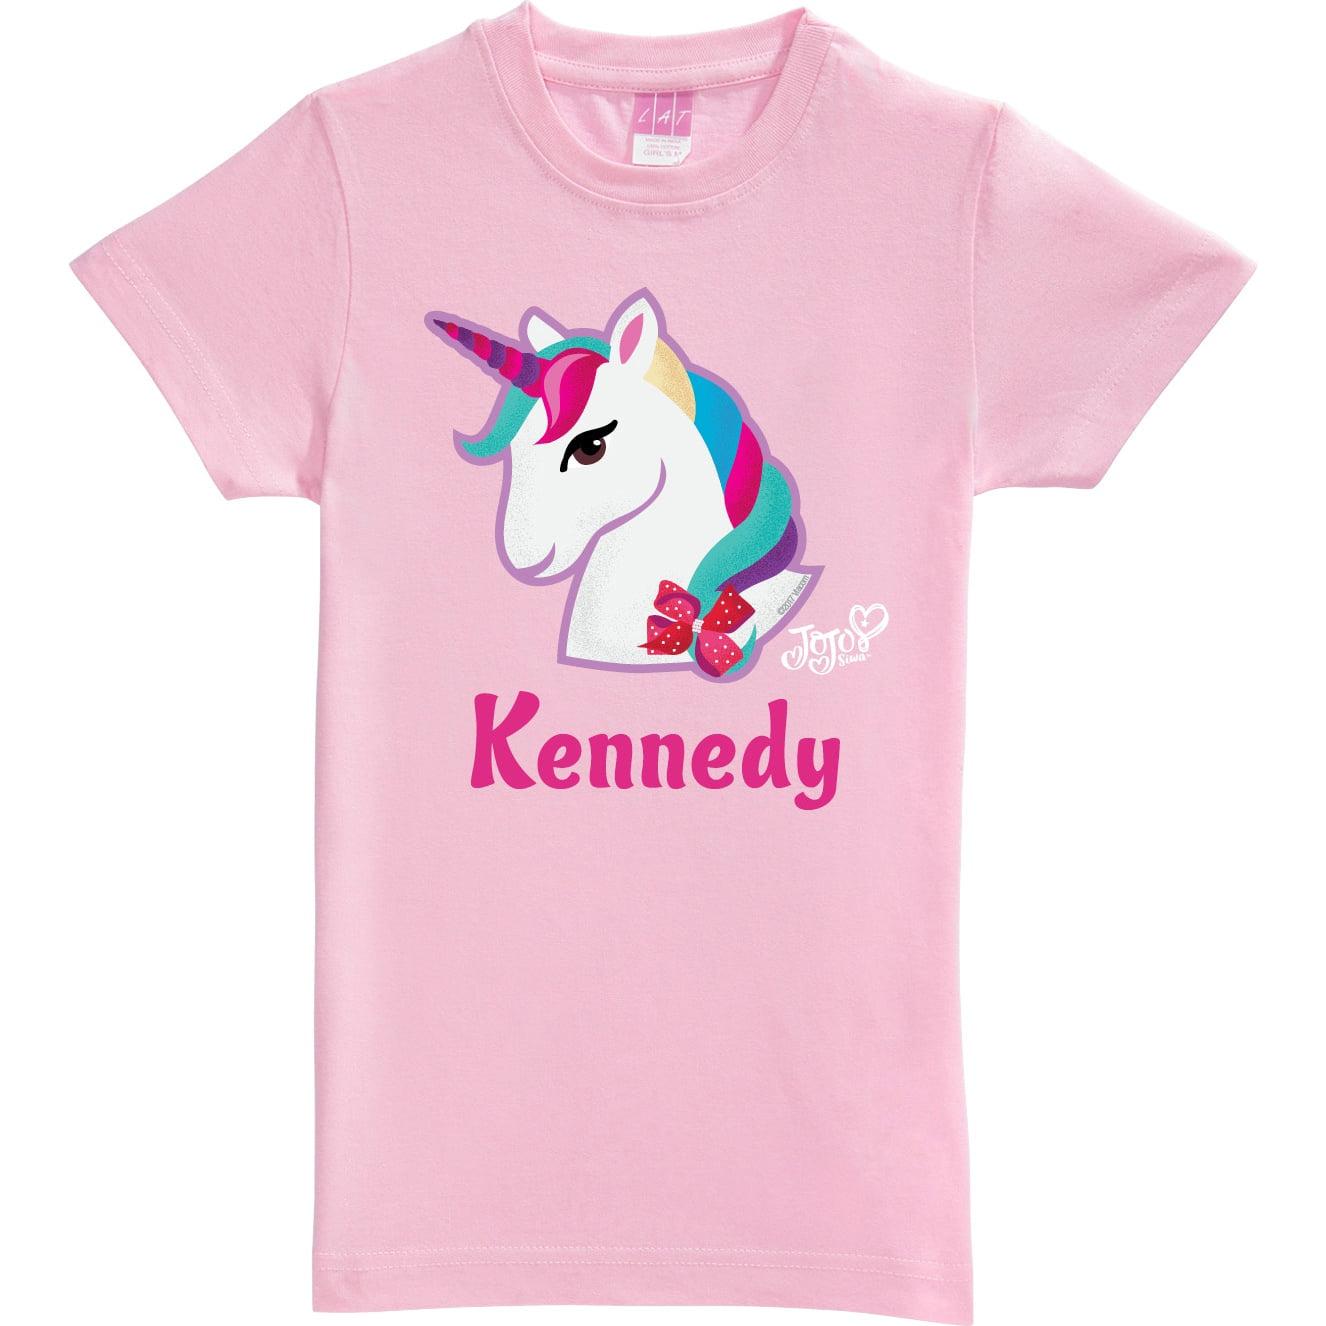 175ae2a03981 Personalized JoJo Siwa T-Shirt - Unicorn Pink Youth Fitted Tee - Walmart.com